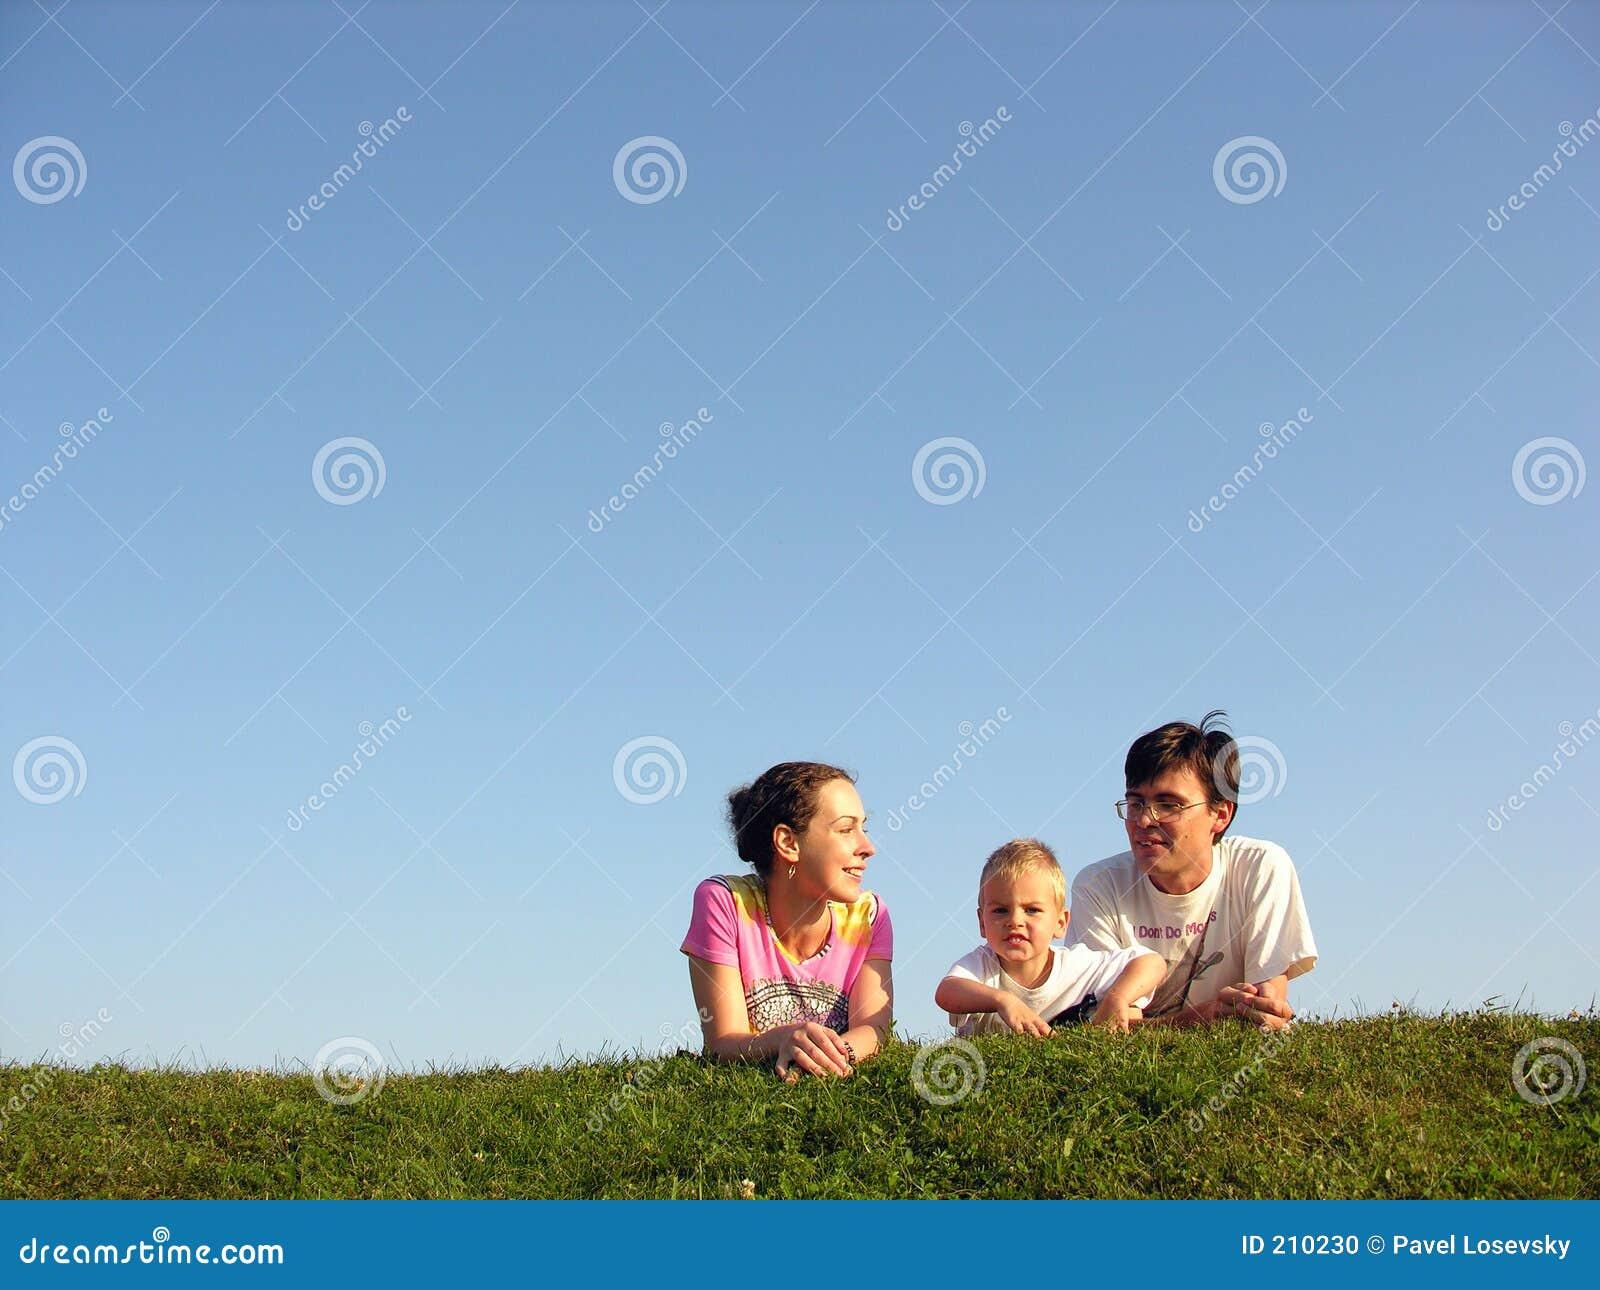 Family on herb under sky